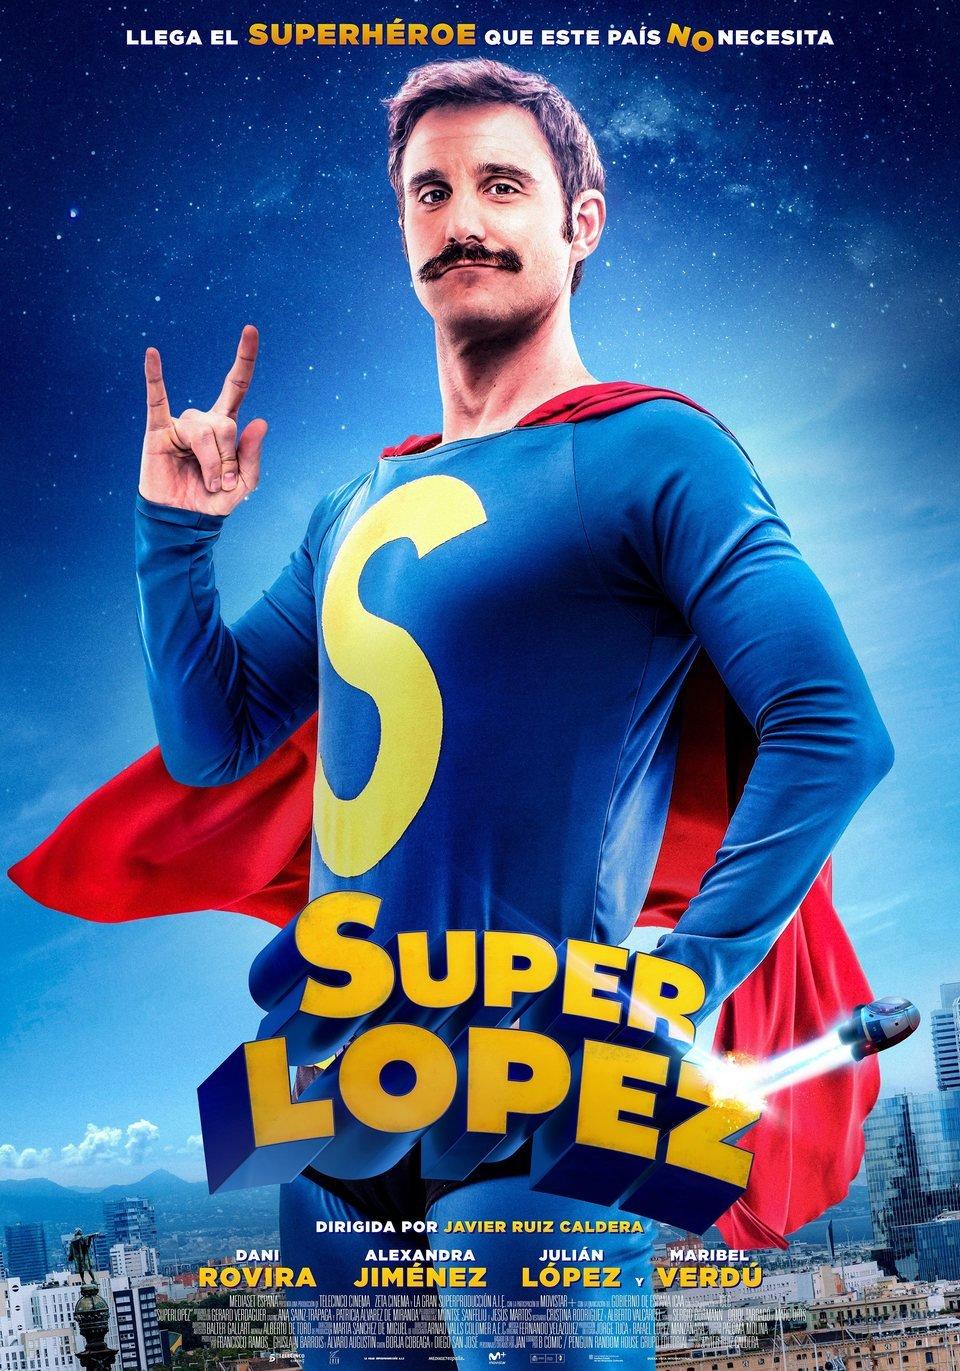 Cartel Definitivo de 'Superlópez'